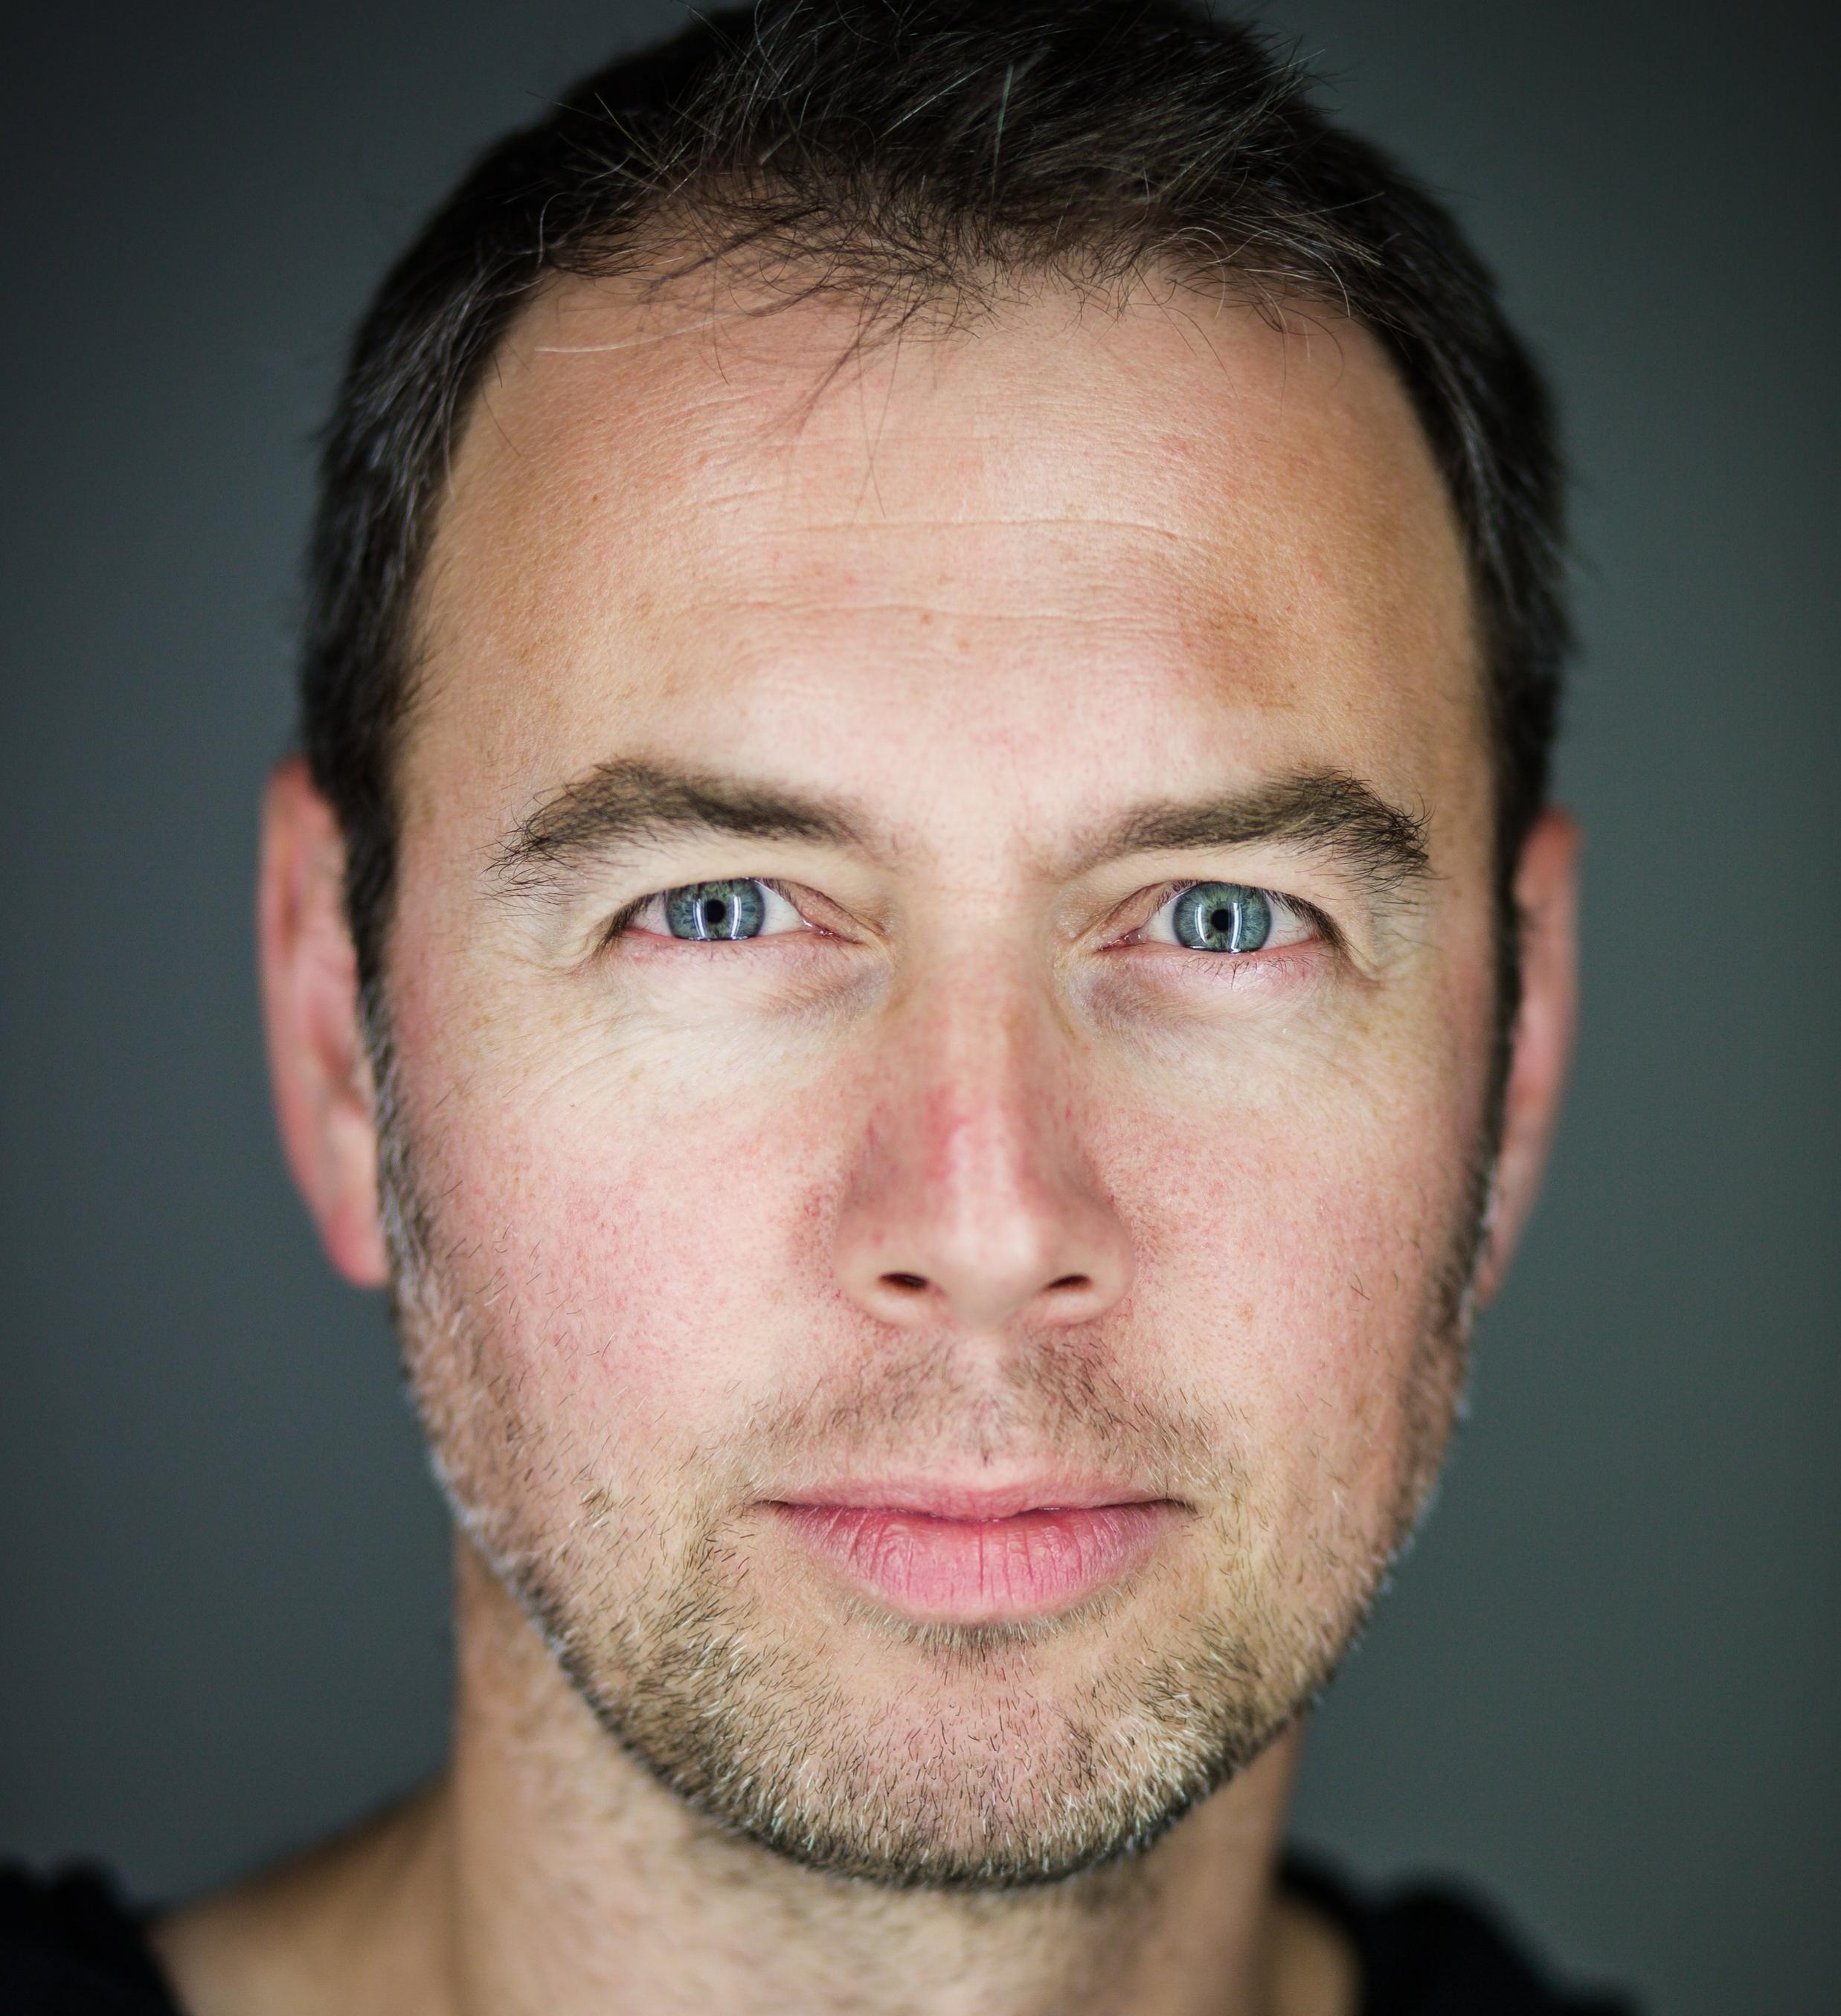 Foto Markus Heingärtner